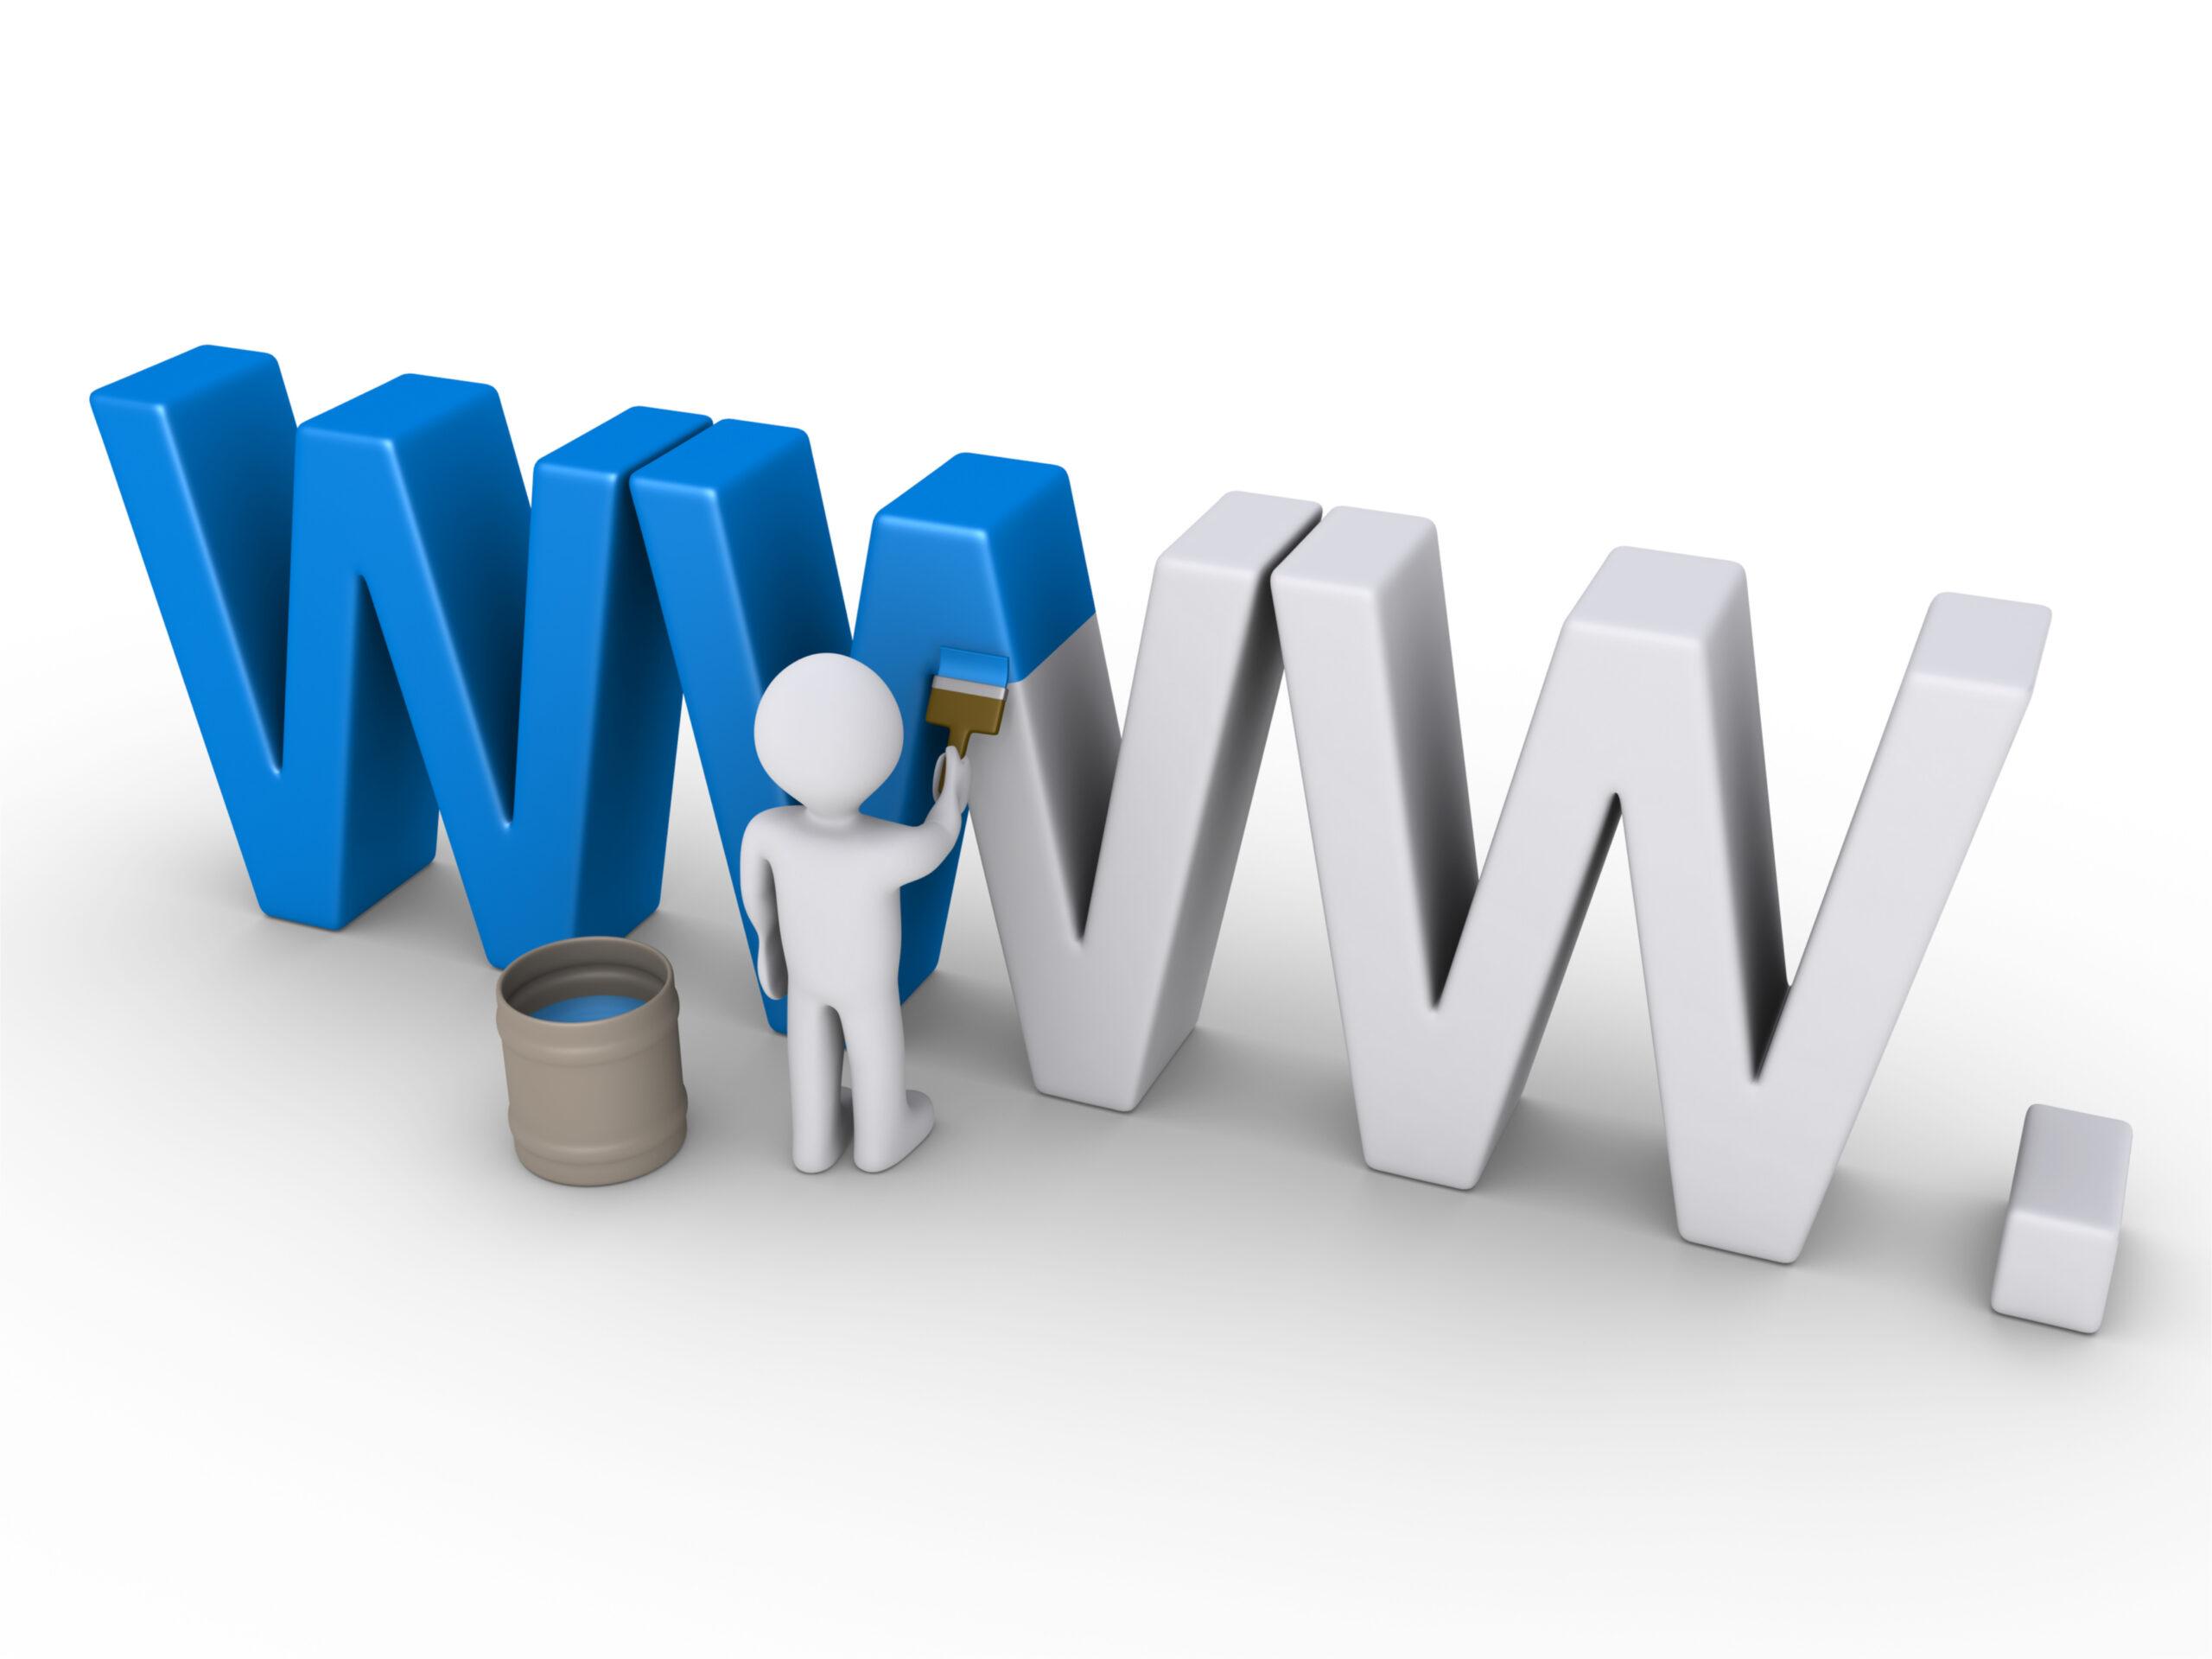 The new UIHJ website is online